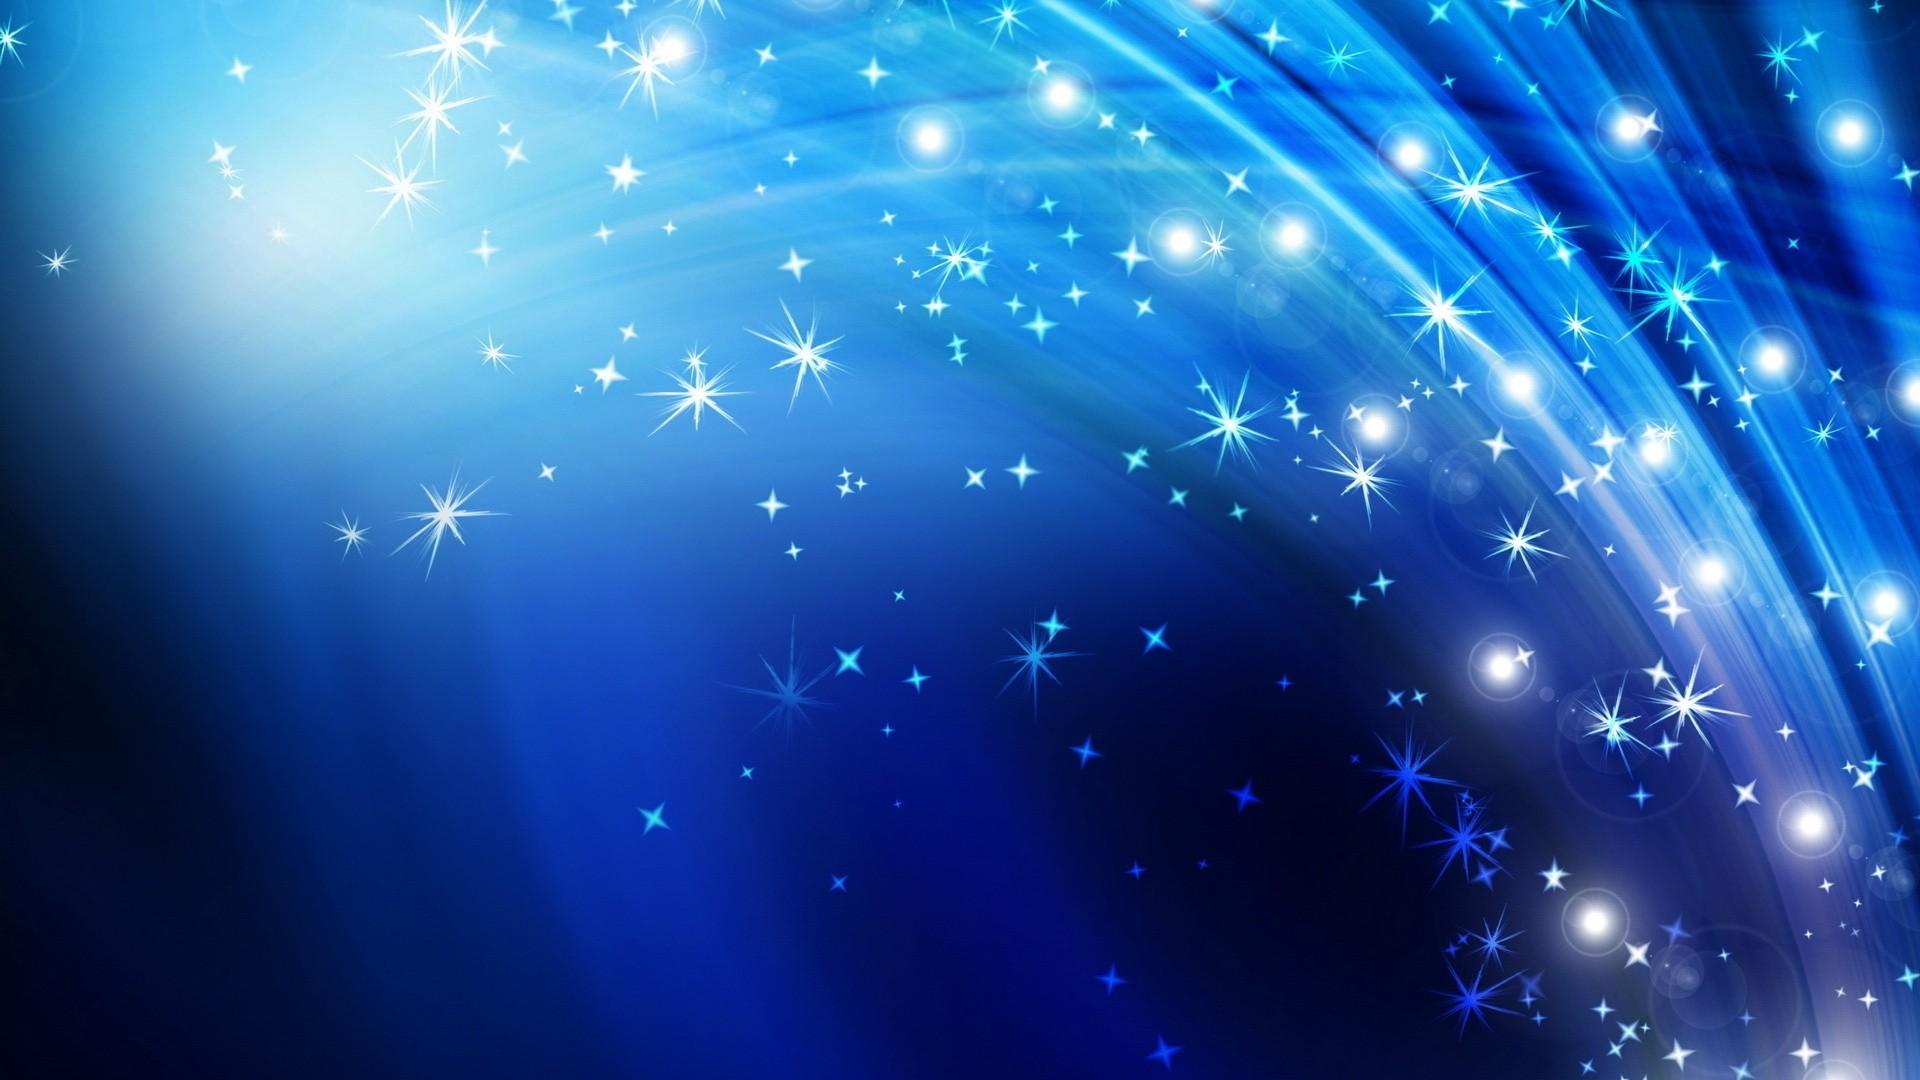 Spark Blue Desktop Wallpaper